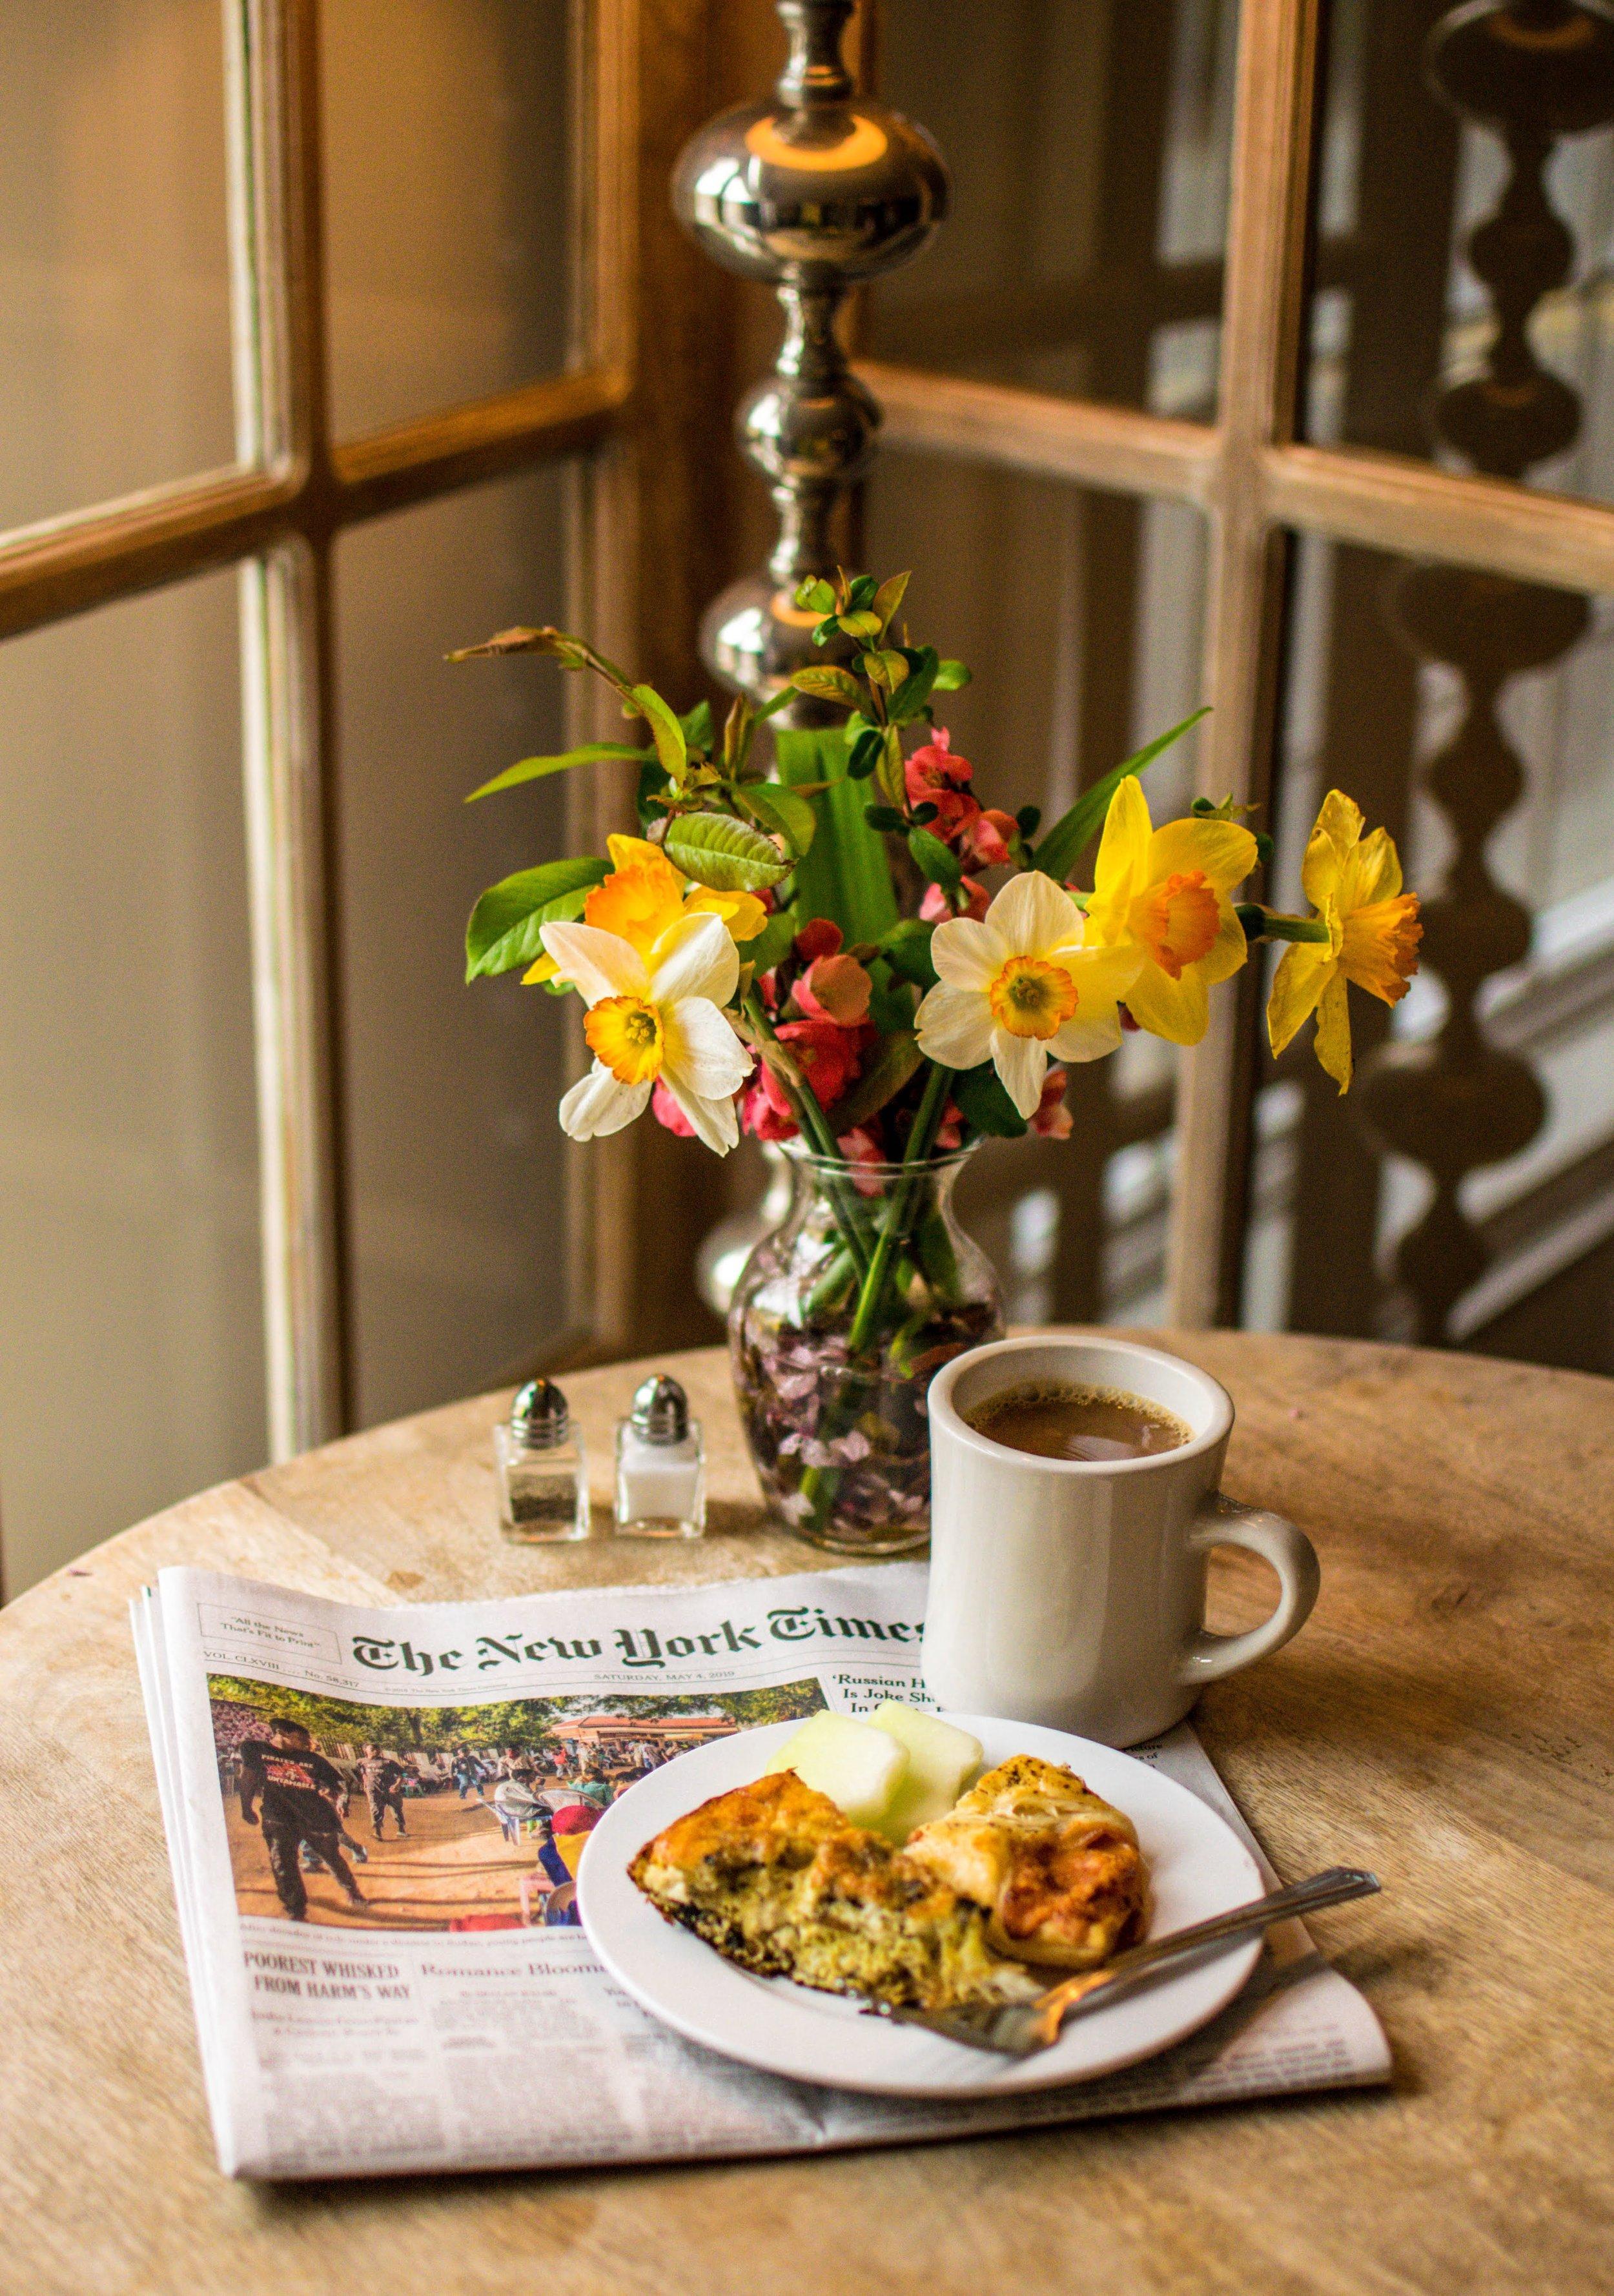 Breakfast table with flowers, coffee, food